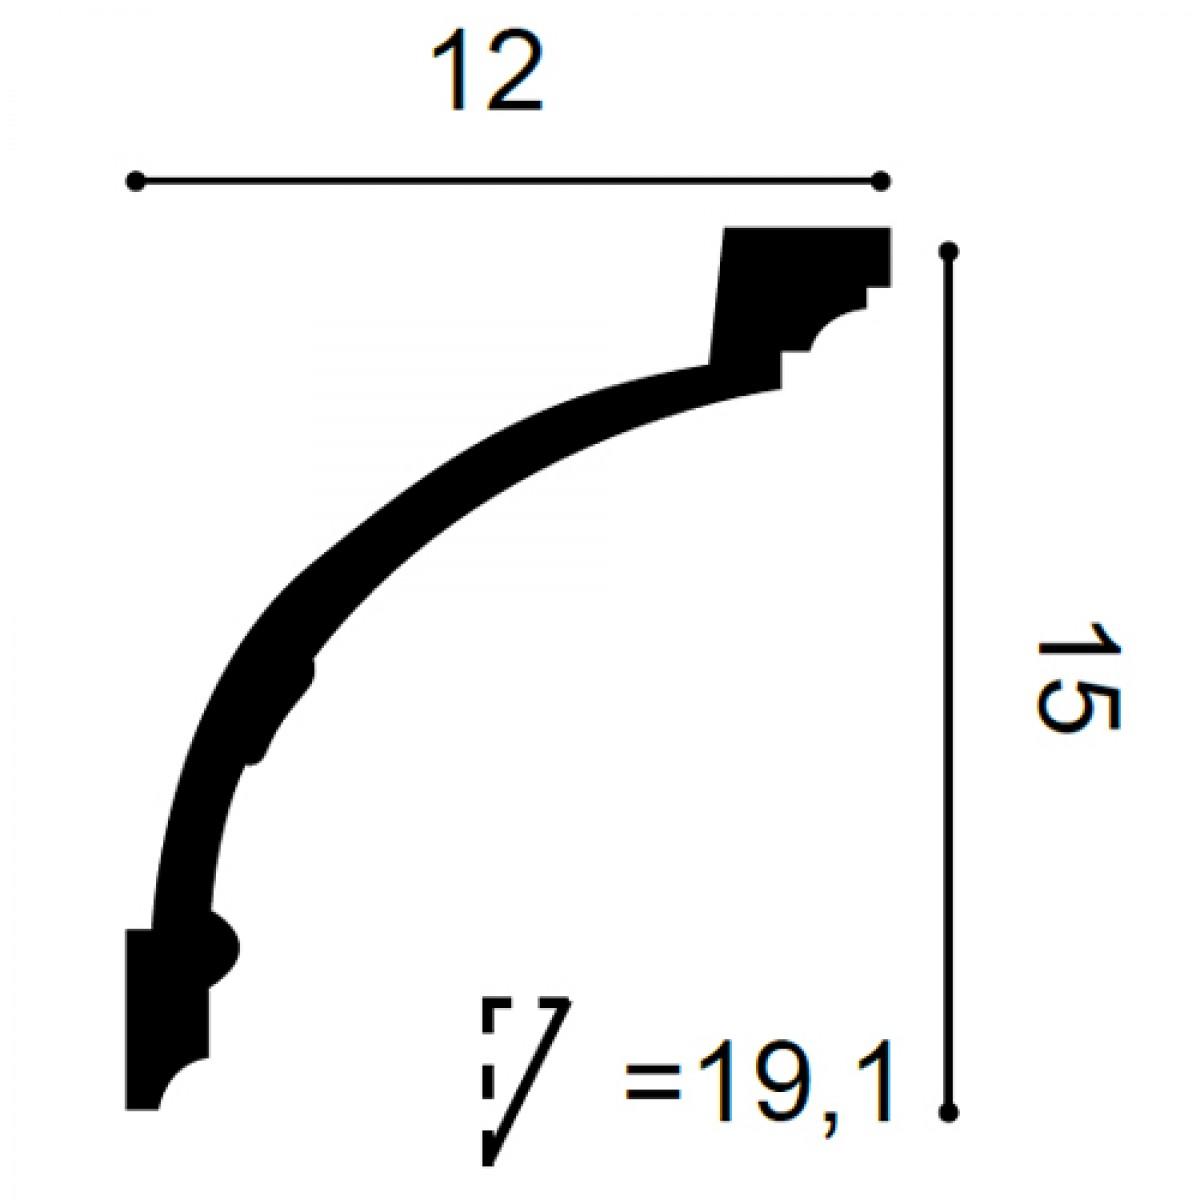 Cornisa Flex Luxxus C218F, Dimensiuni: 200 X 15 X 12 cm, Orac Decor